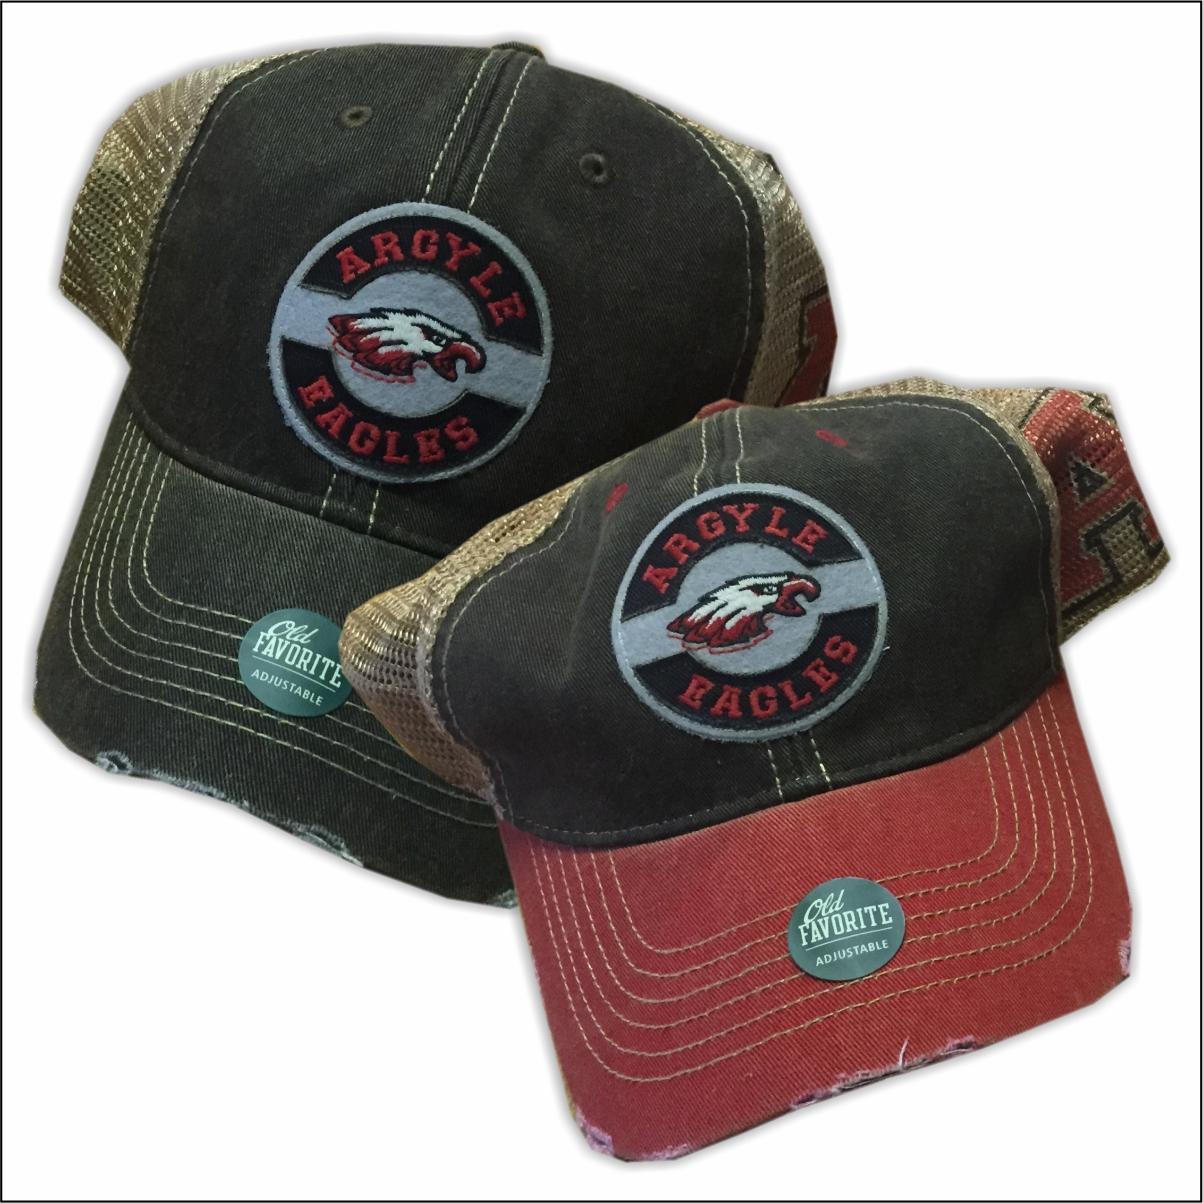 argyle legacy hat black bill flipdog sportswear argyle plain hat